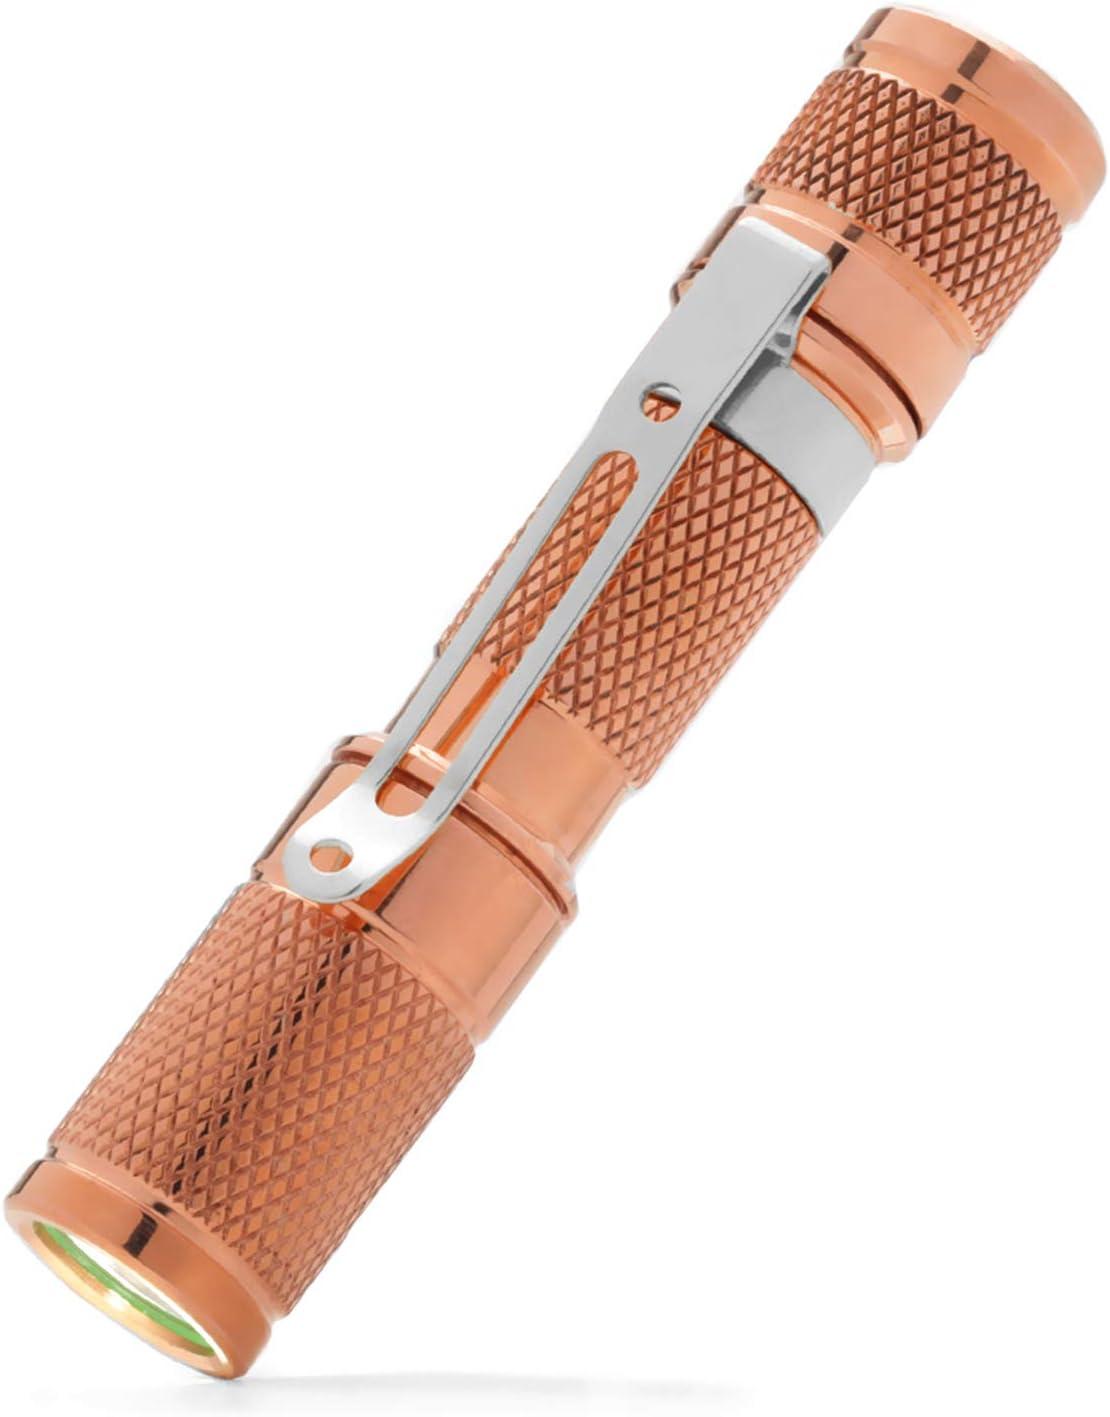 DROP AAA Copper Flashlight — EDC Mini Pocket LED Torch, IPX-8 Waterproof, 3 Modes, 1.5 oz, 110 lumens (Nichia 219C LED) (Drop AAA Copper - Nichia)